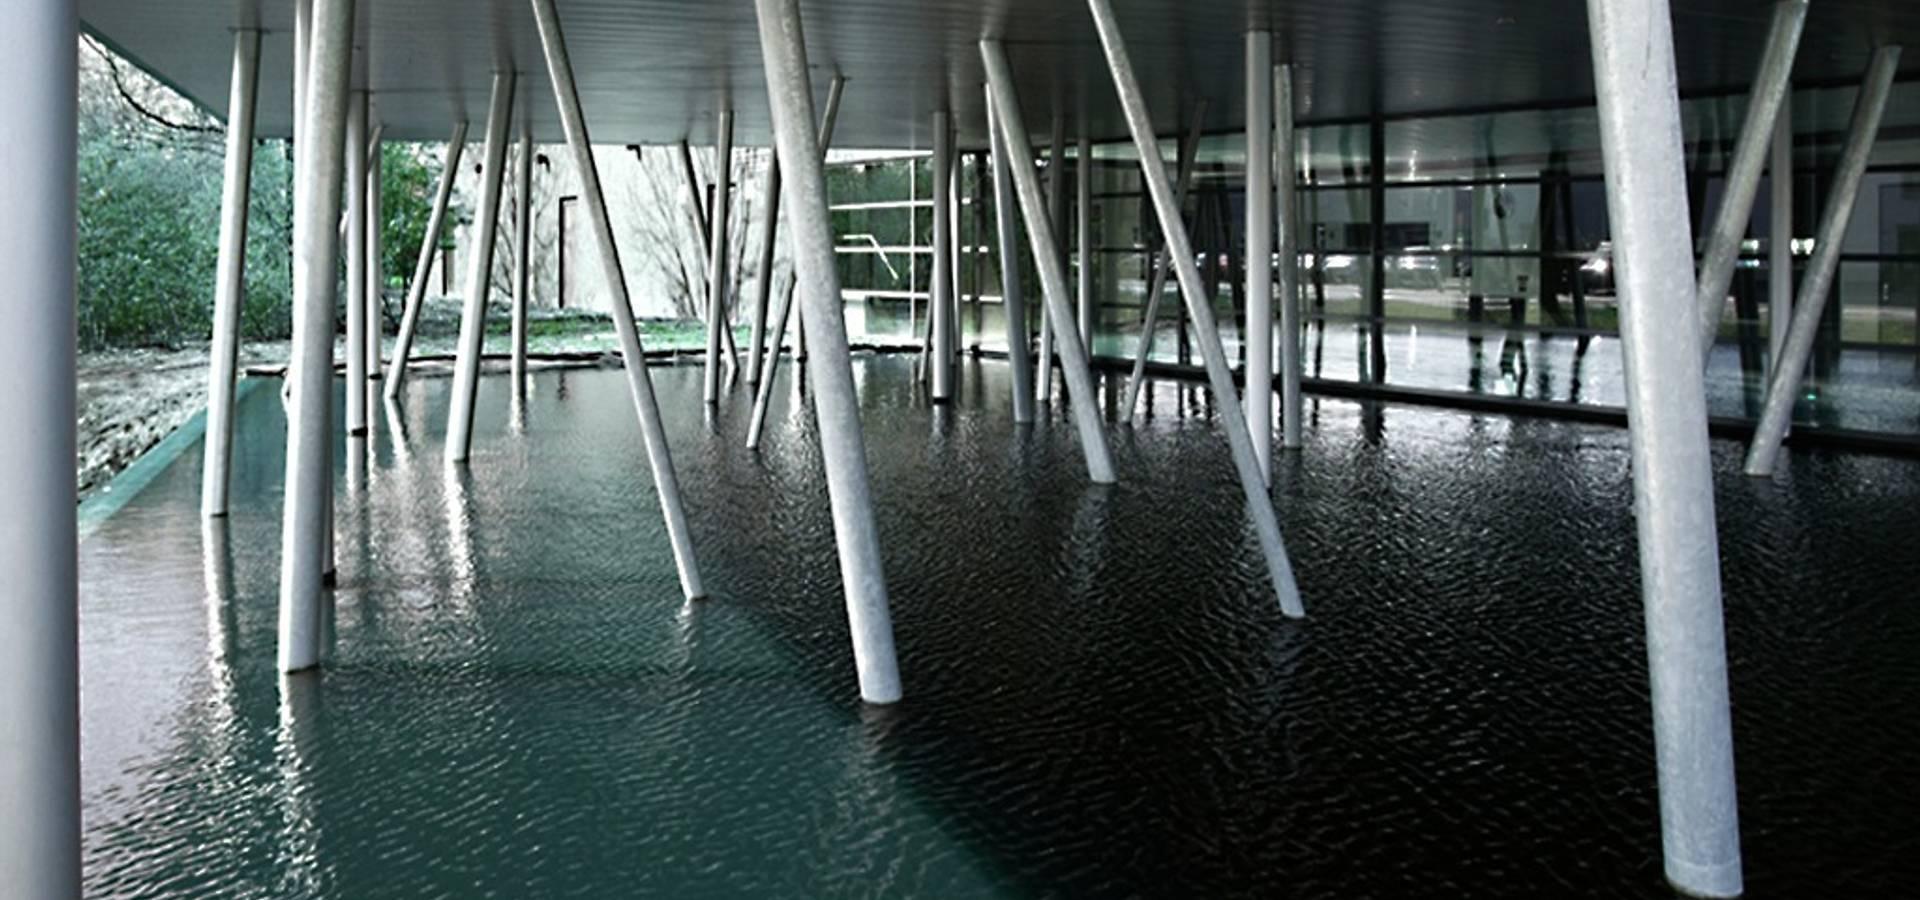 Archivice Architektenburo